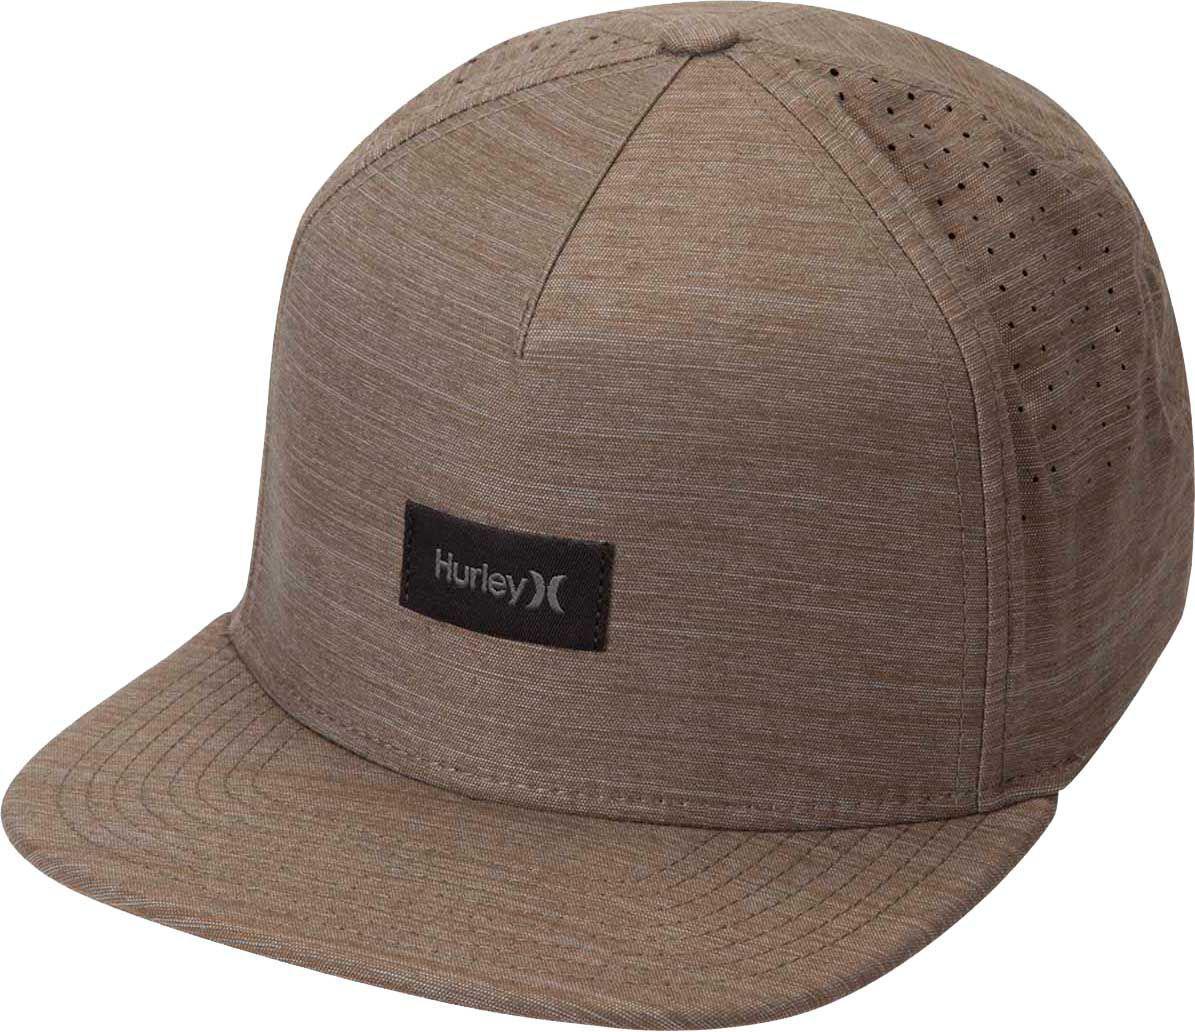 Lyst - Hurley Dri-fit Staple Hat for Men 422261e864f